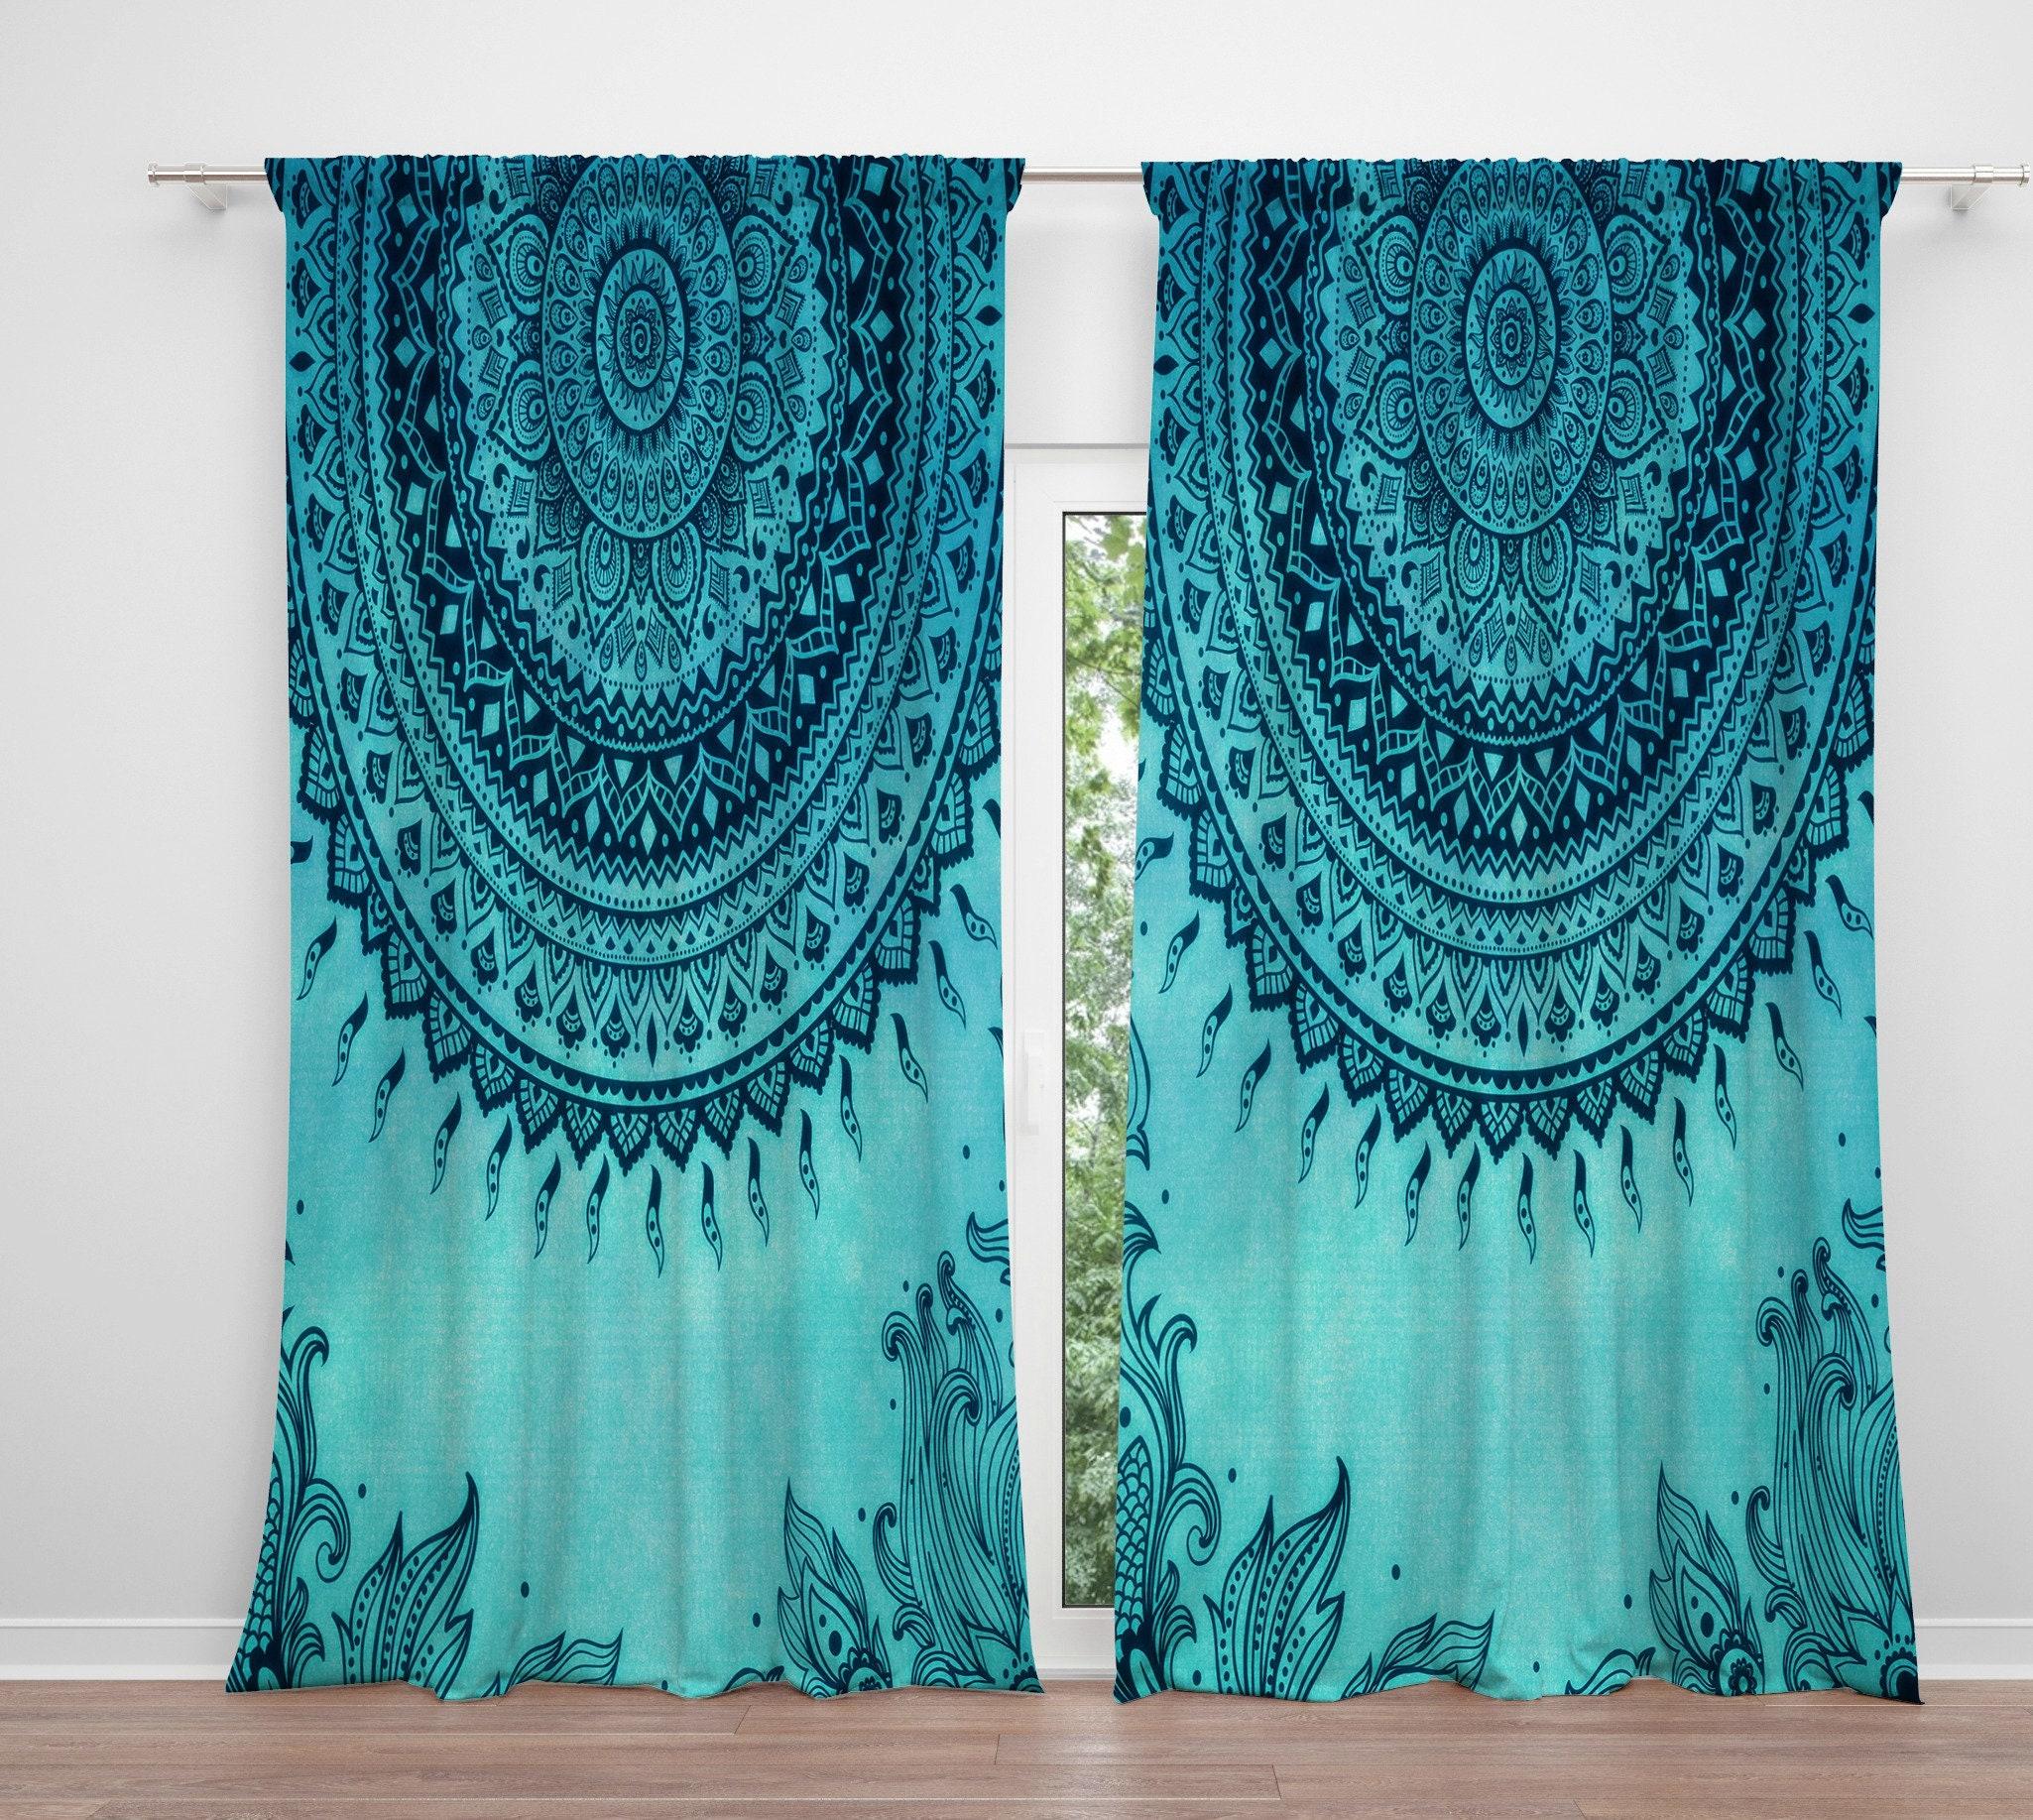 Turquoise Window Curtains , Boho Decor, Mandala, Hippie Gypsy , Window  Treatments, Curtains, Drapes